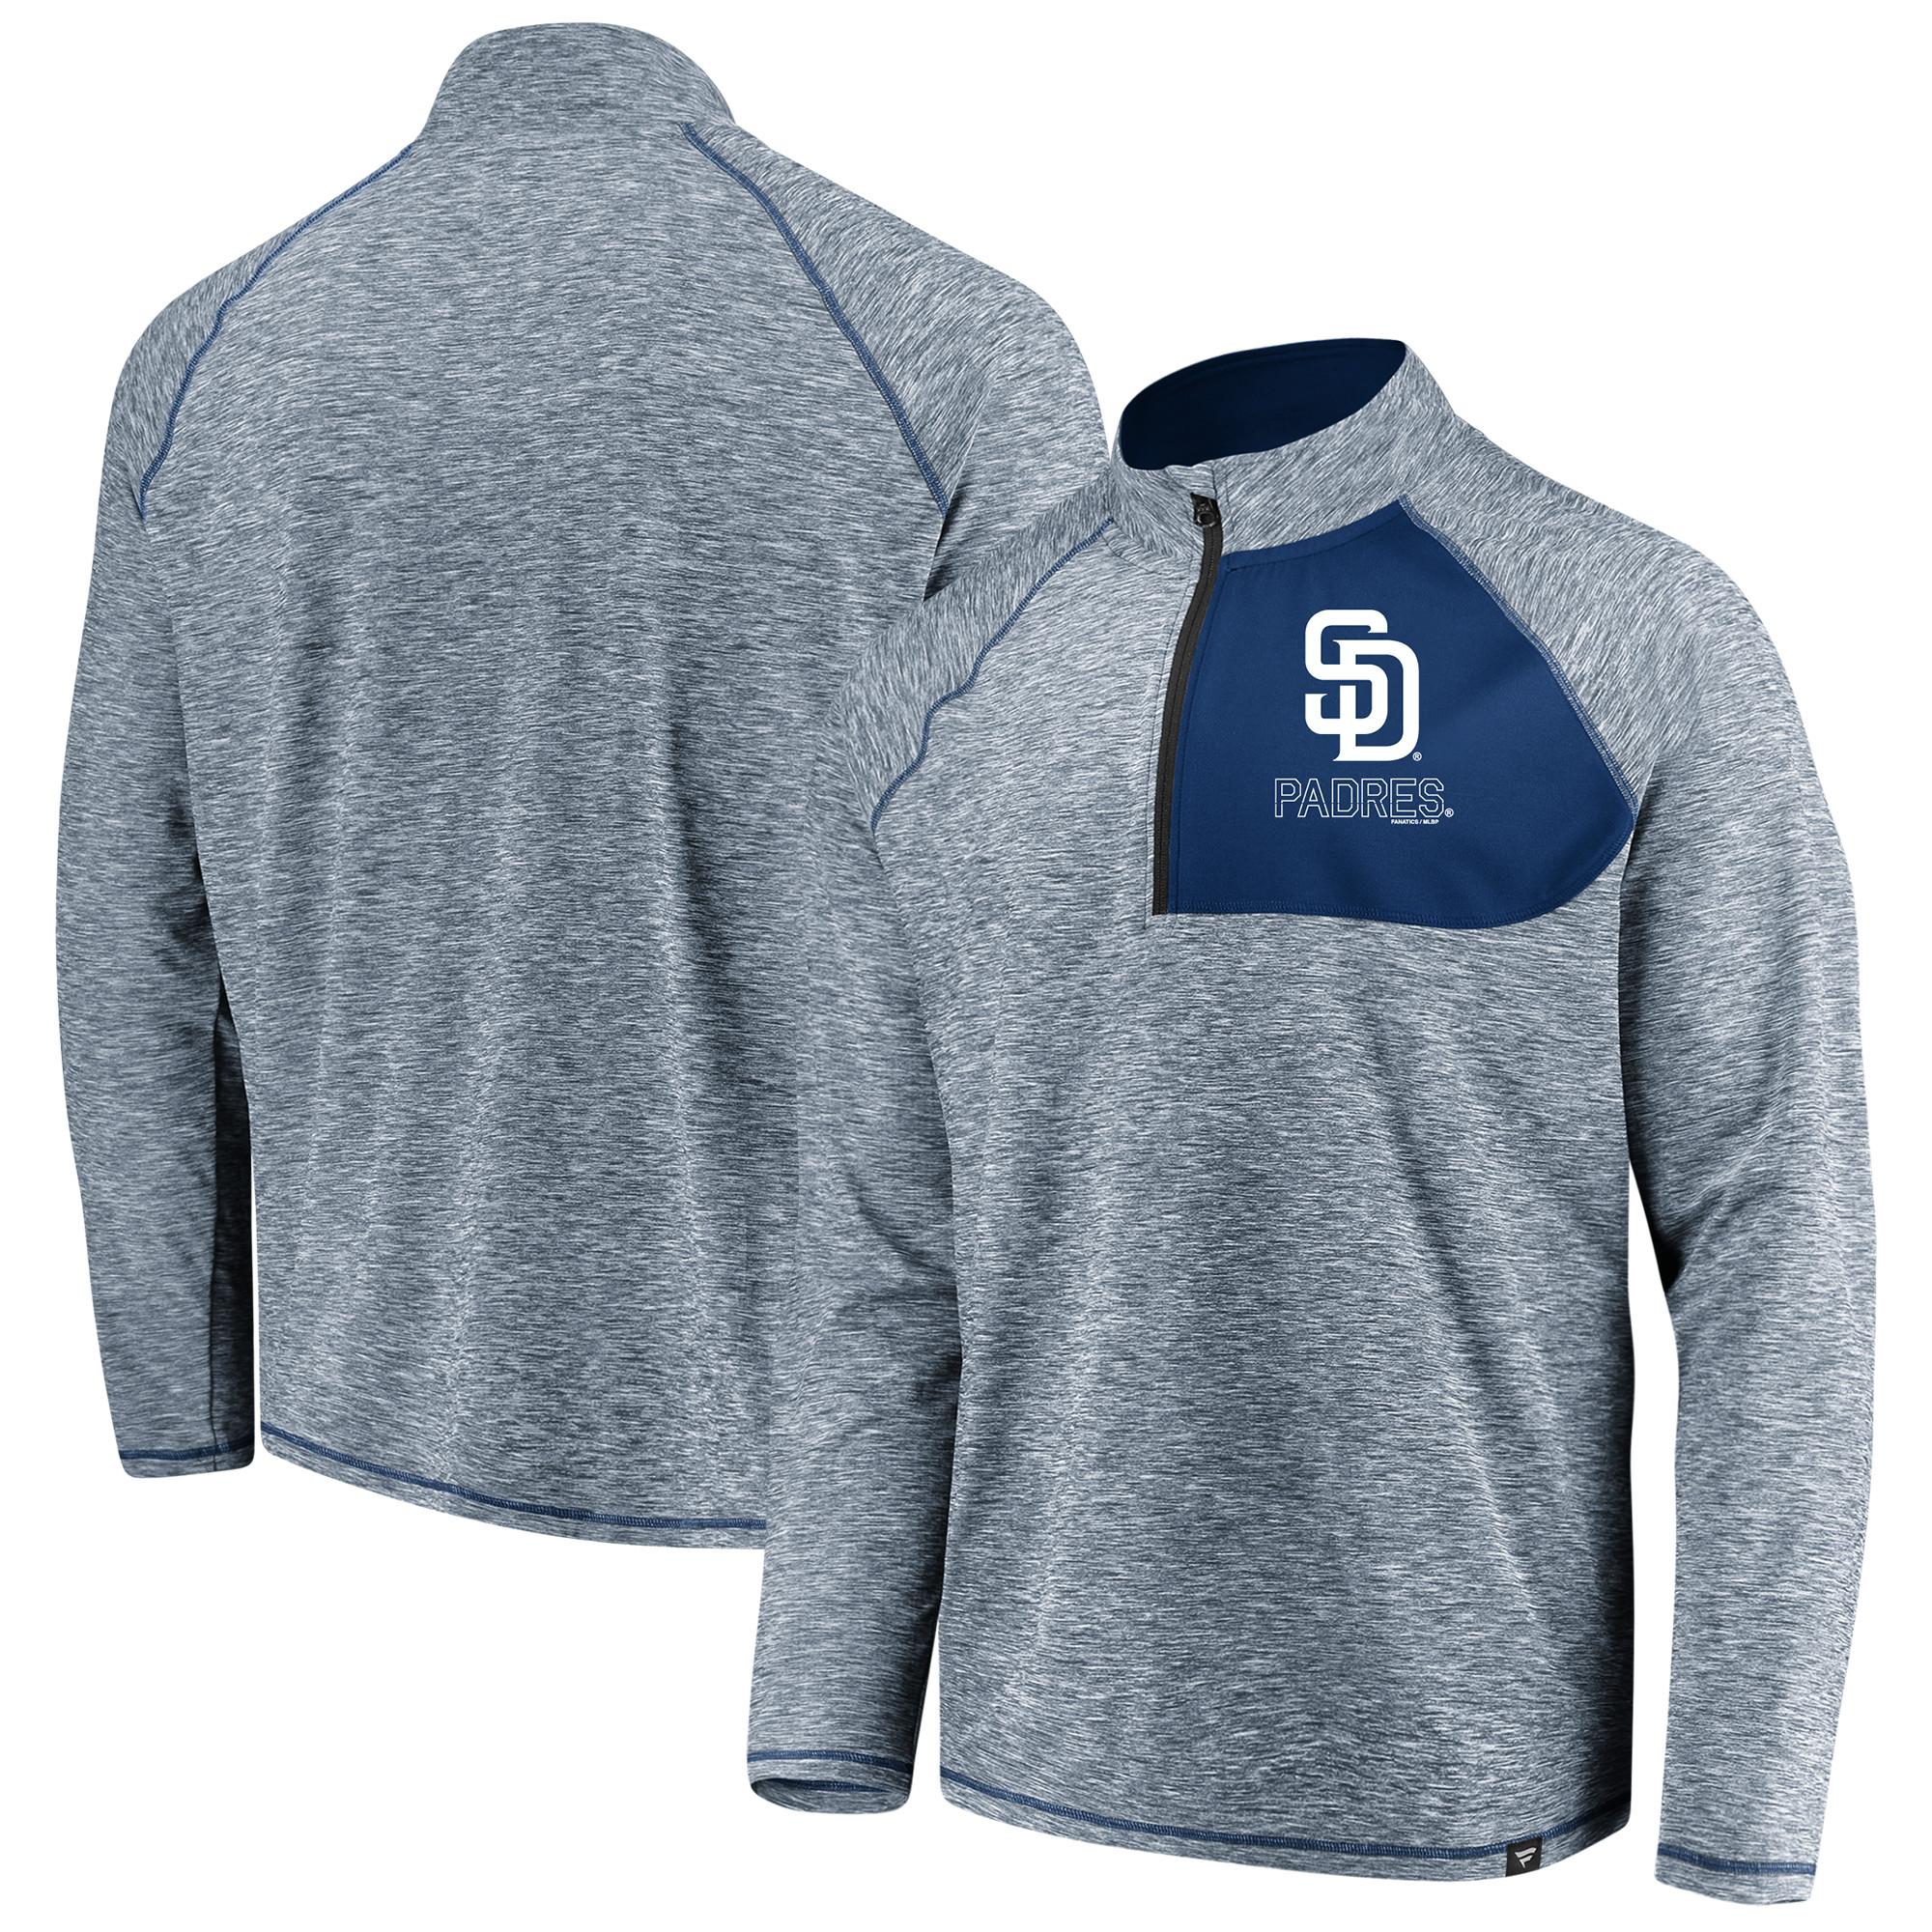 San Diego Padres Fanatics Branded Made 2 Move Quarter-Zip Jacket - Navy